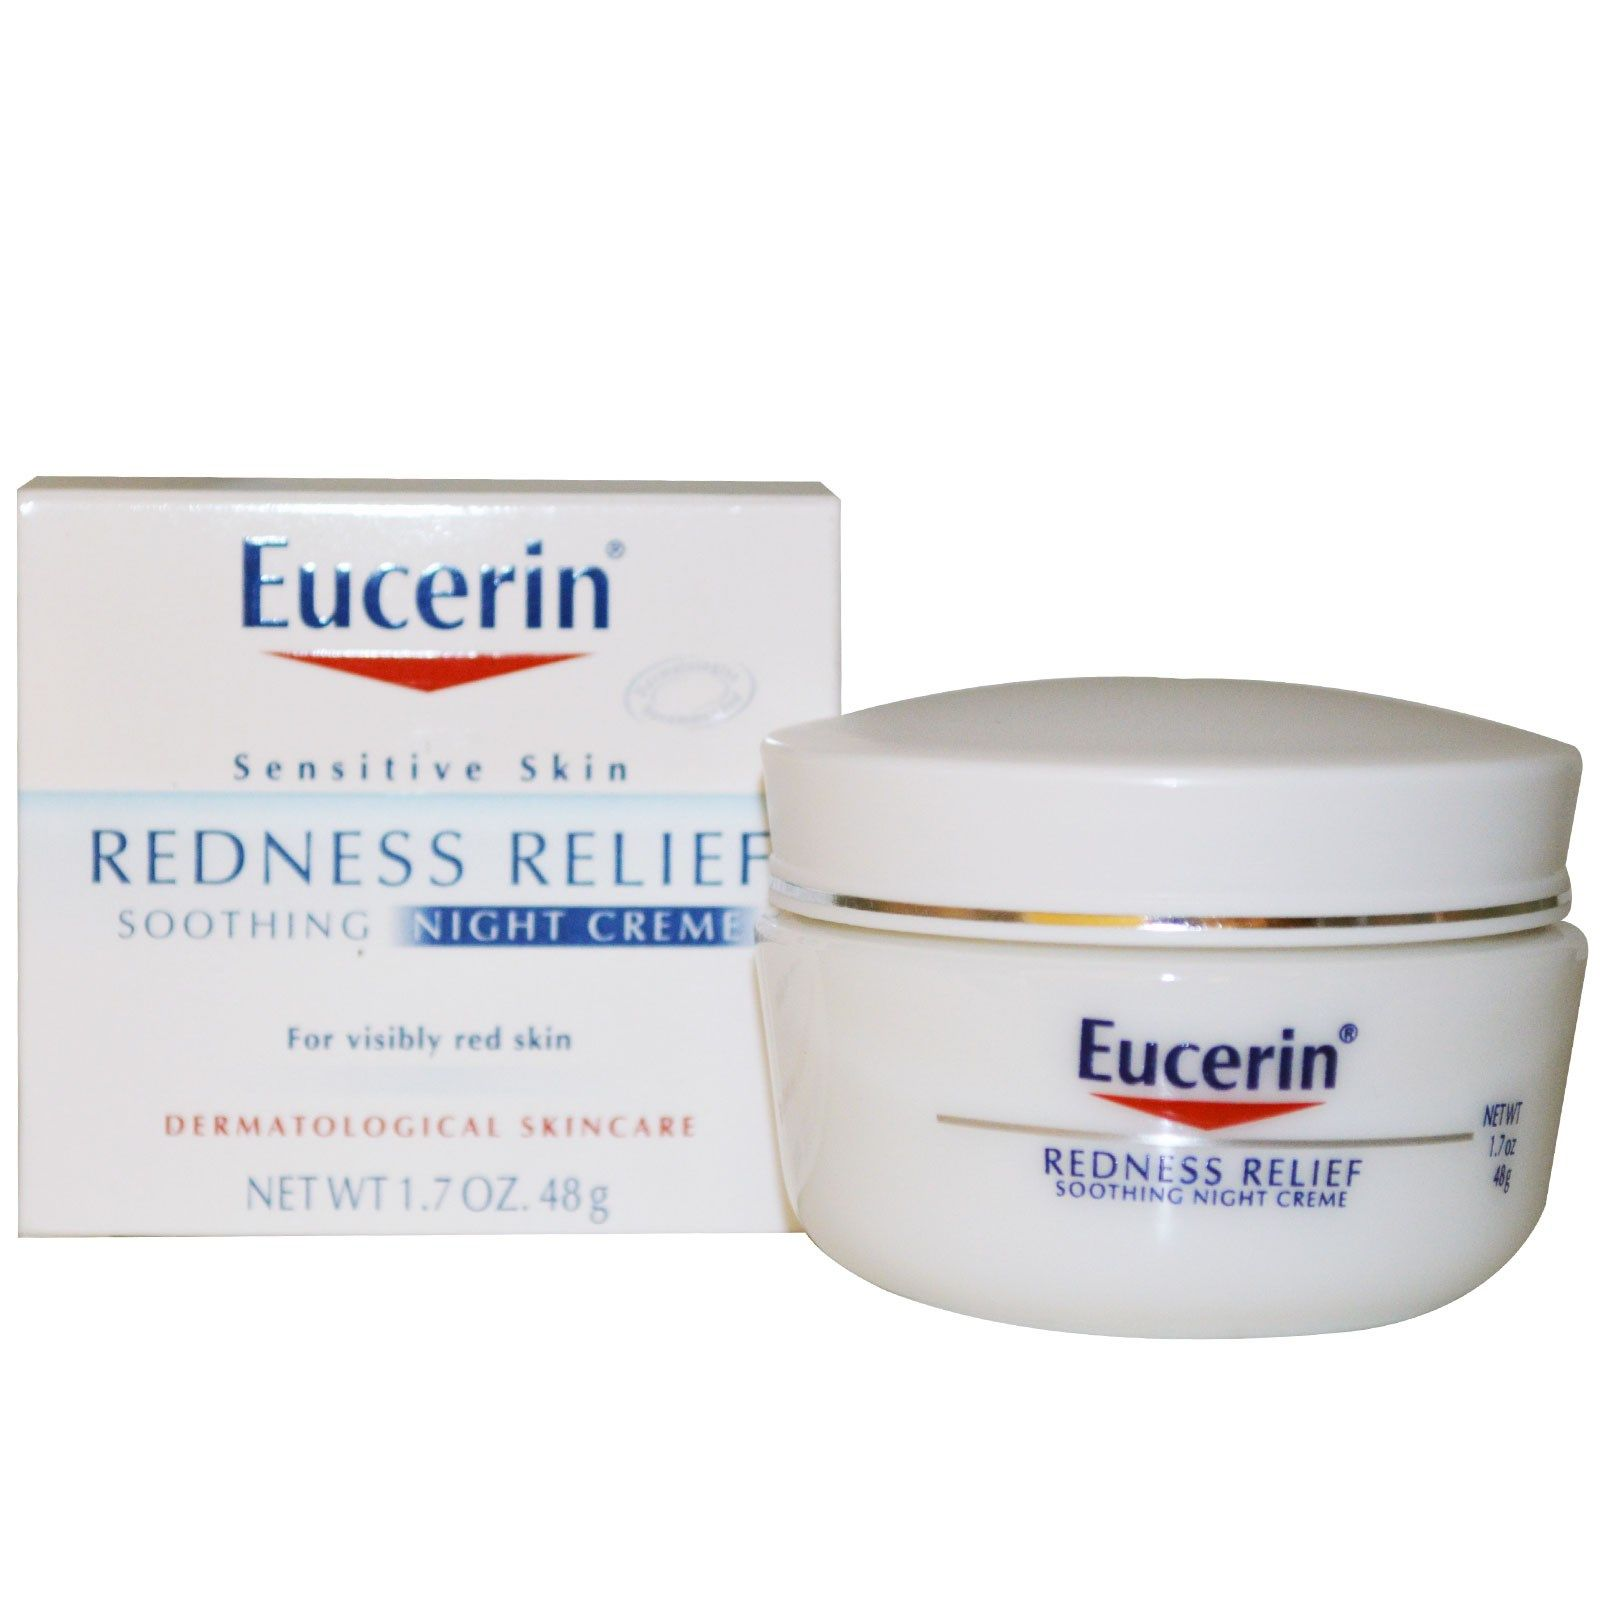 eucerin dermatological skin care